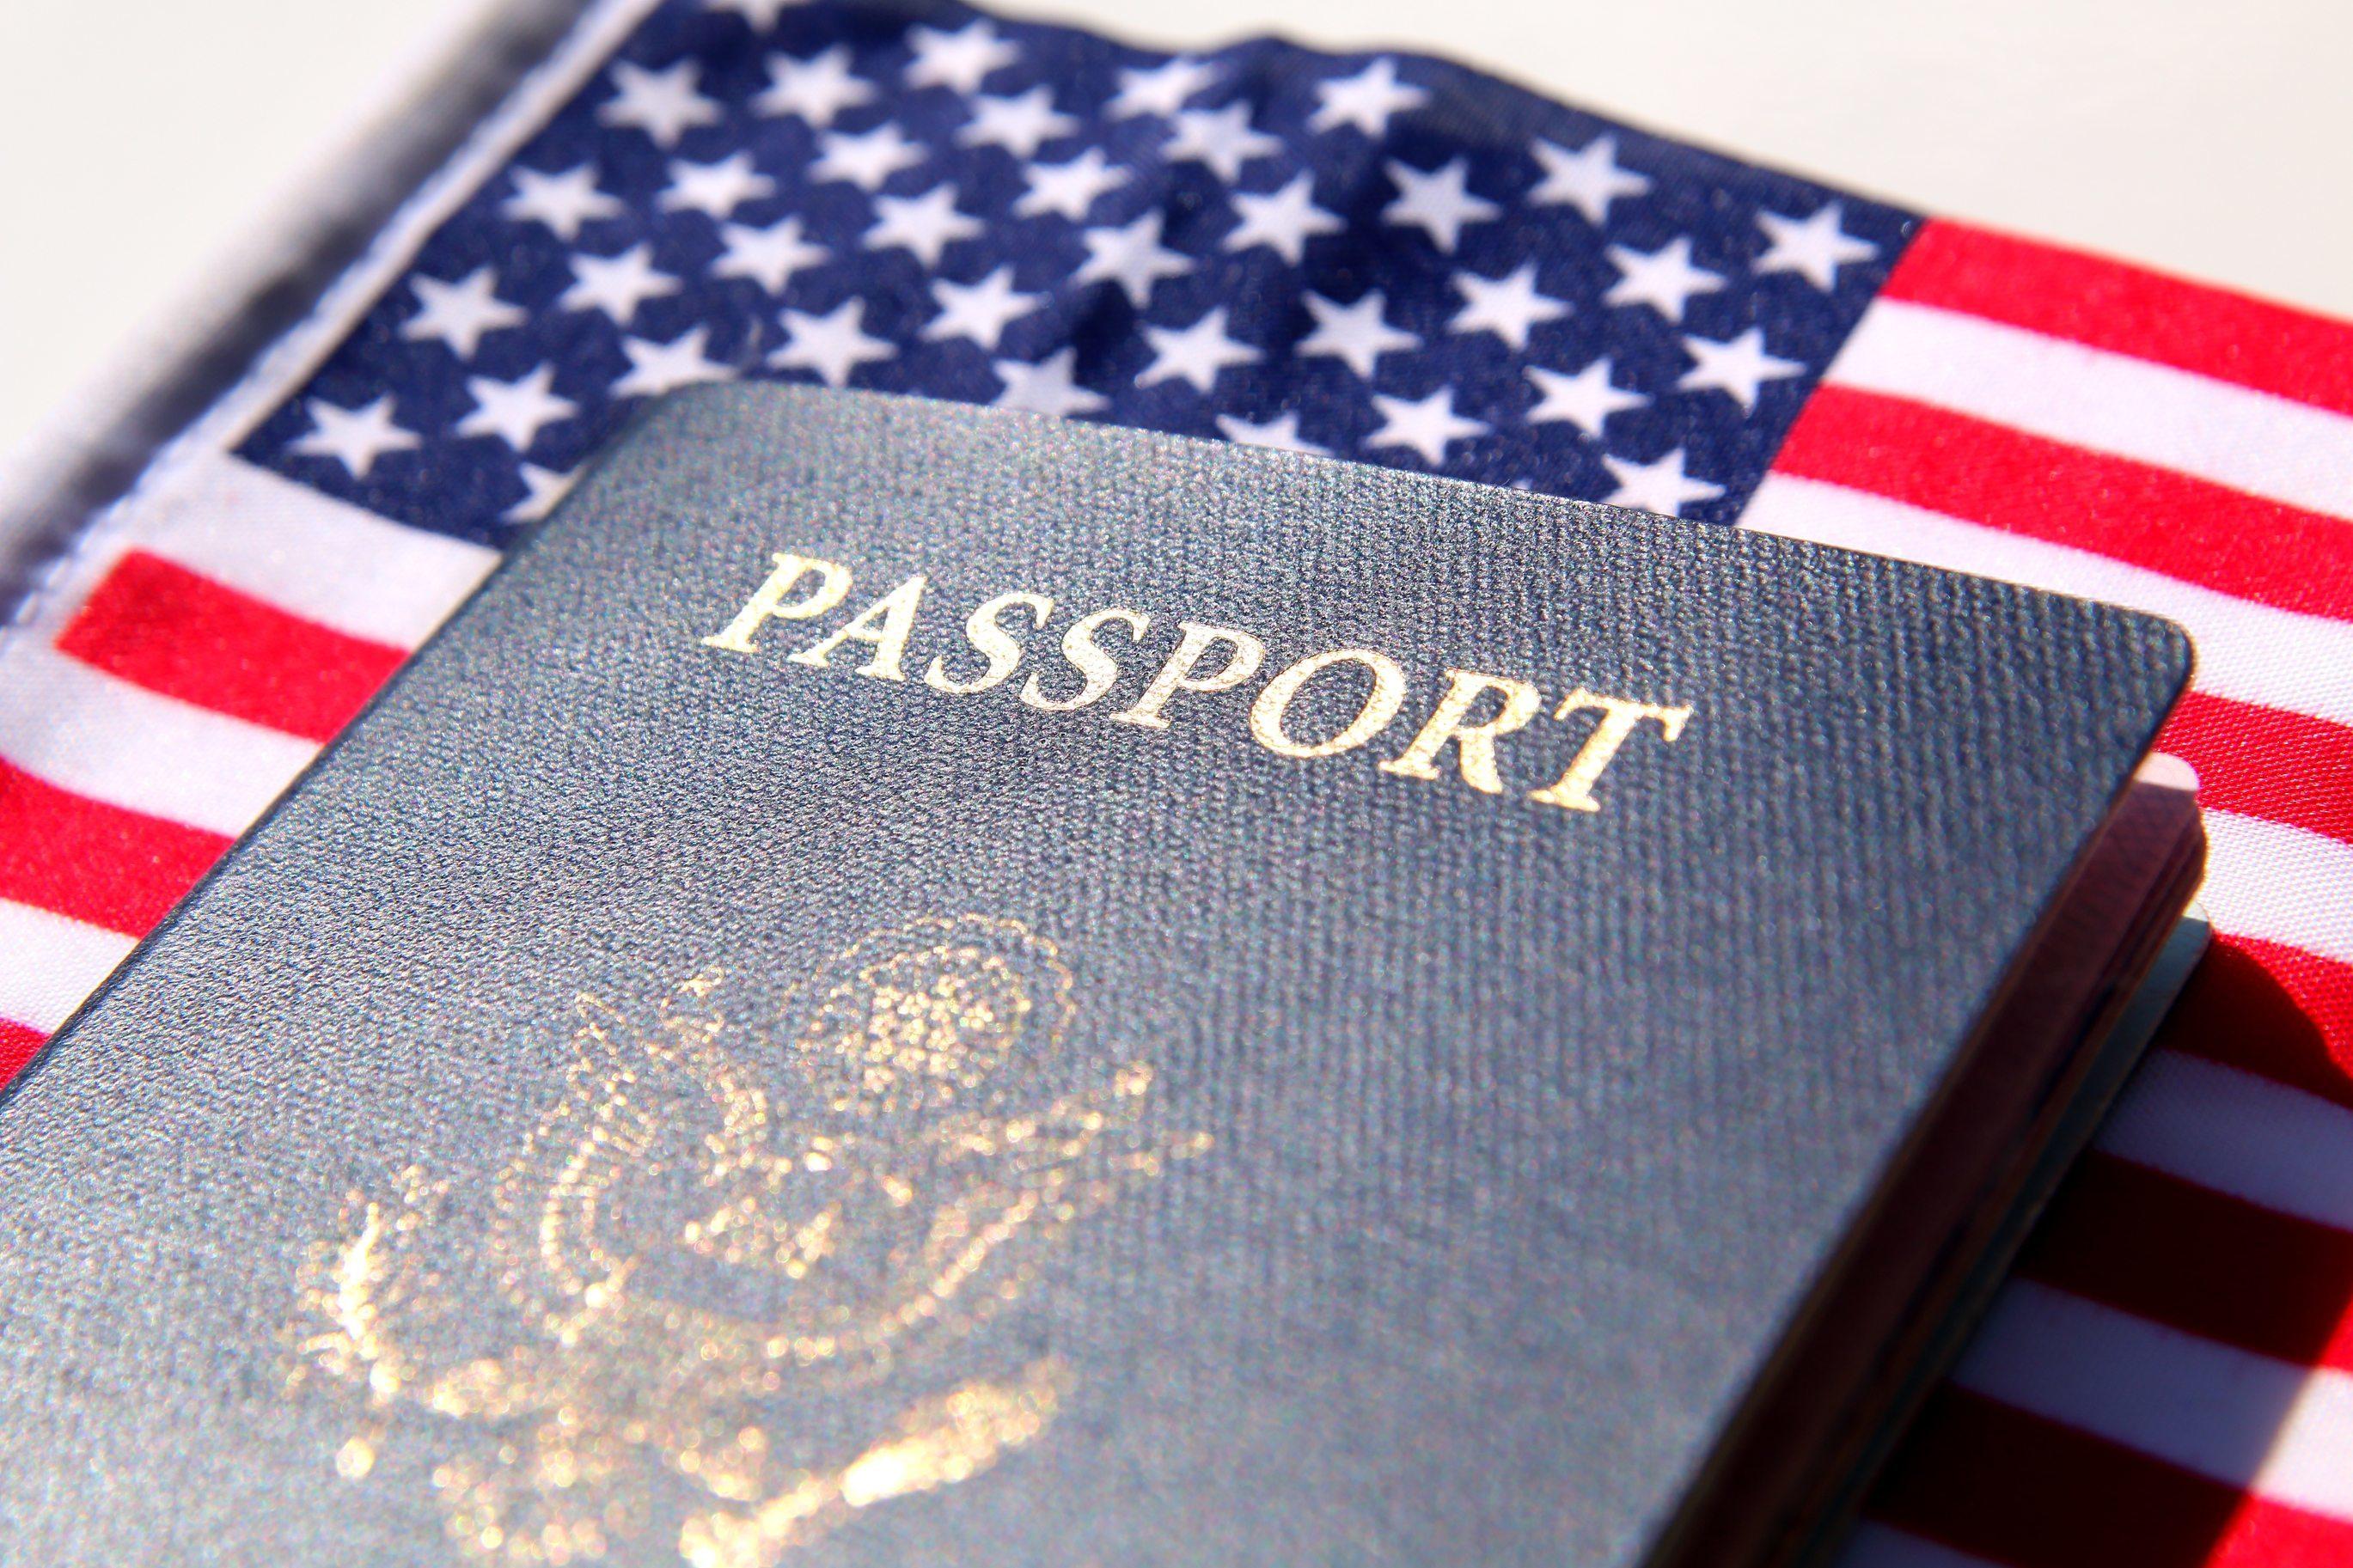 U.S. stops issuing passports, except in emergencies